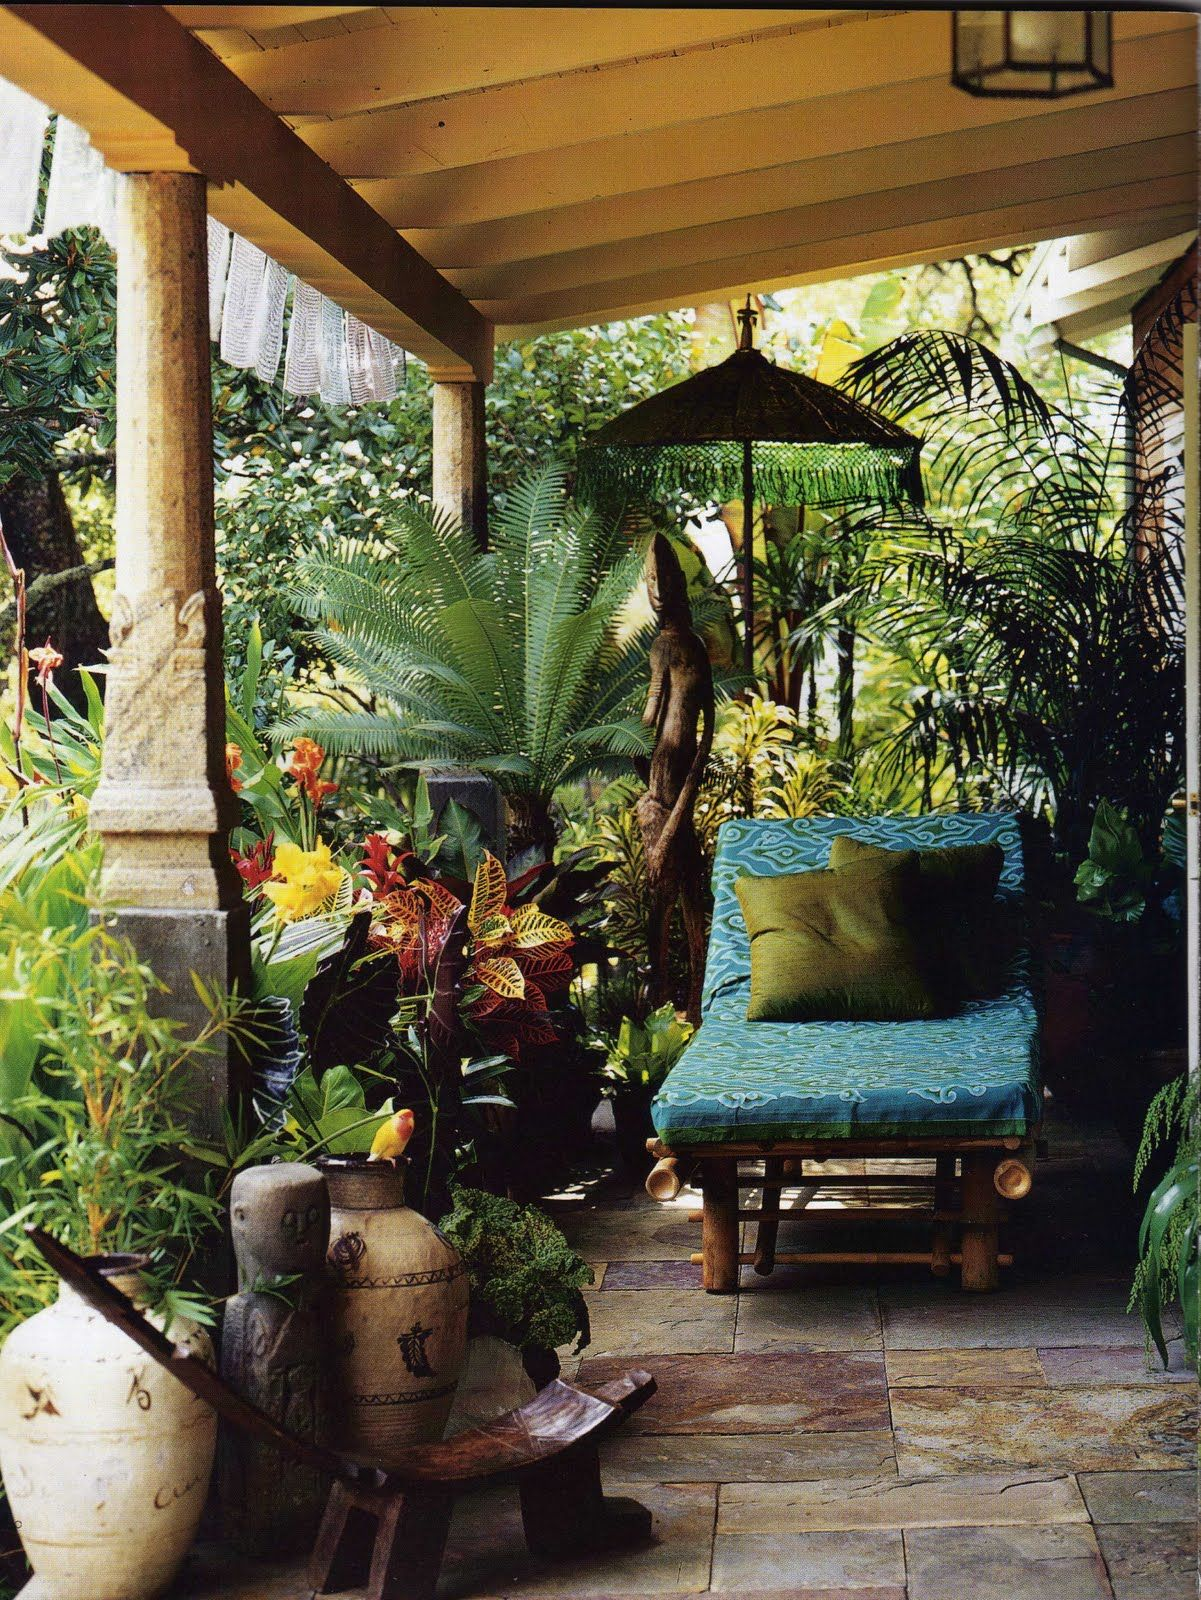 bursting with tropical plants, art, sculpture, umbrellas, and furniture  hidden